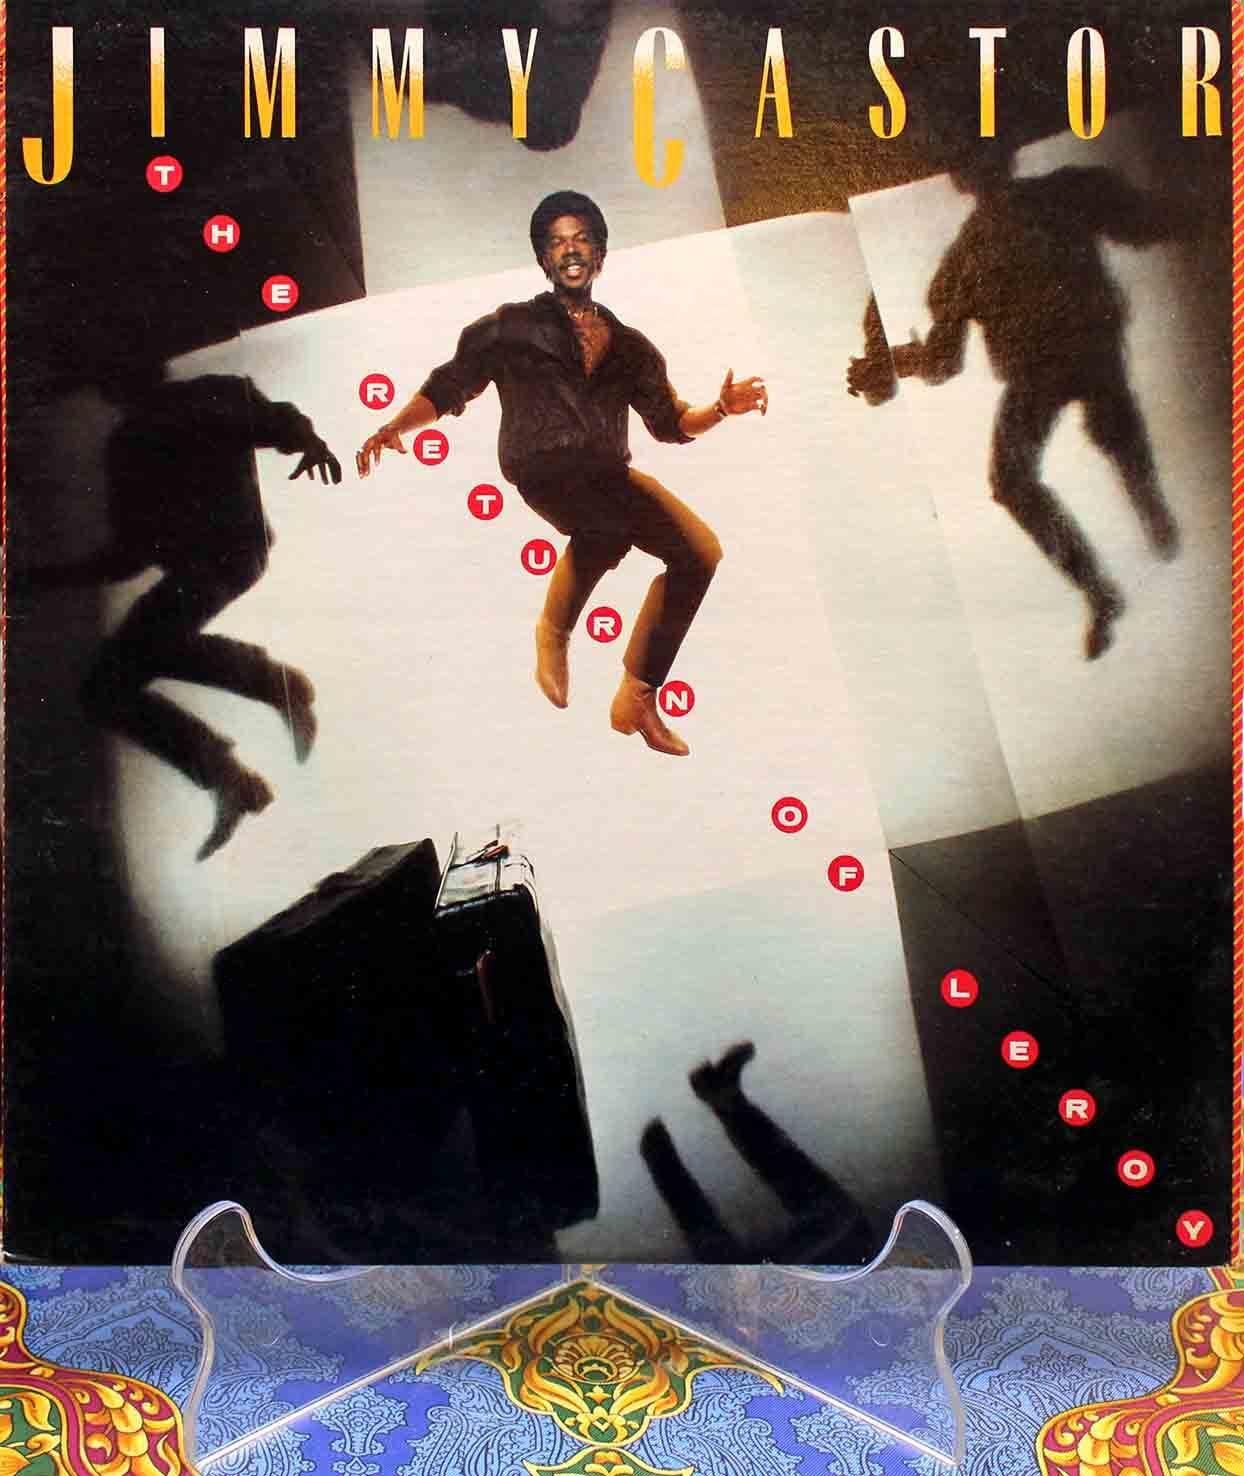 Jimmy Castor – The Return Of Leroy 01